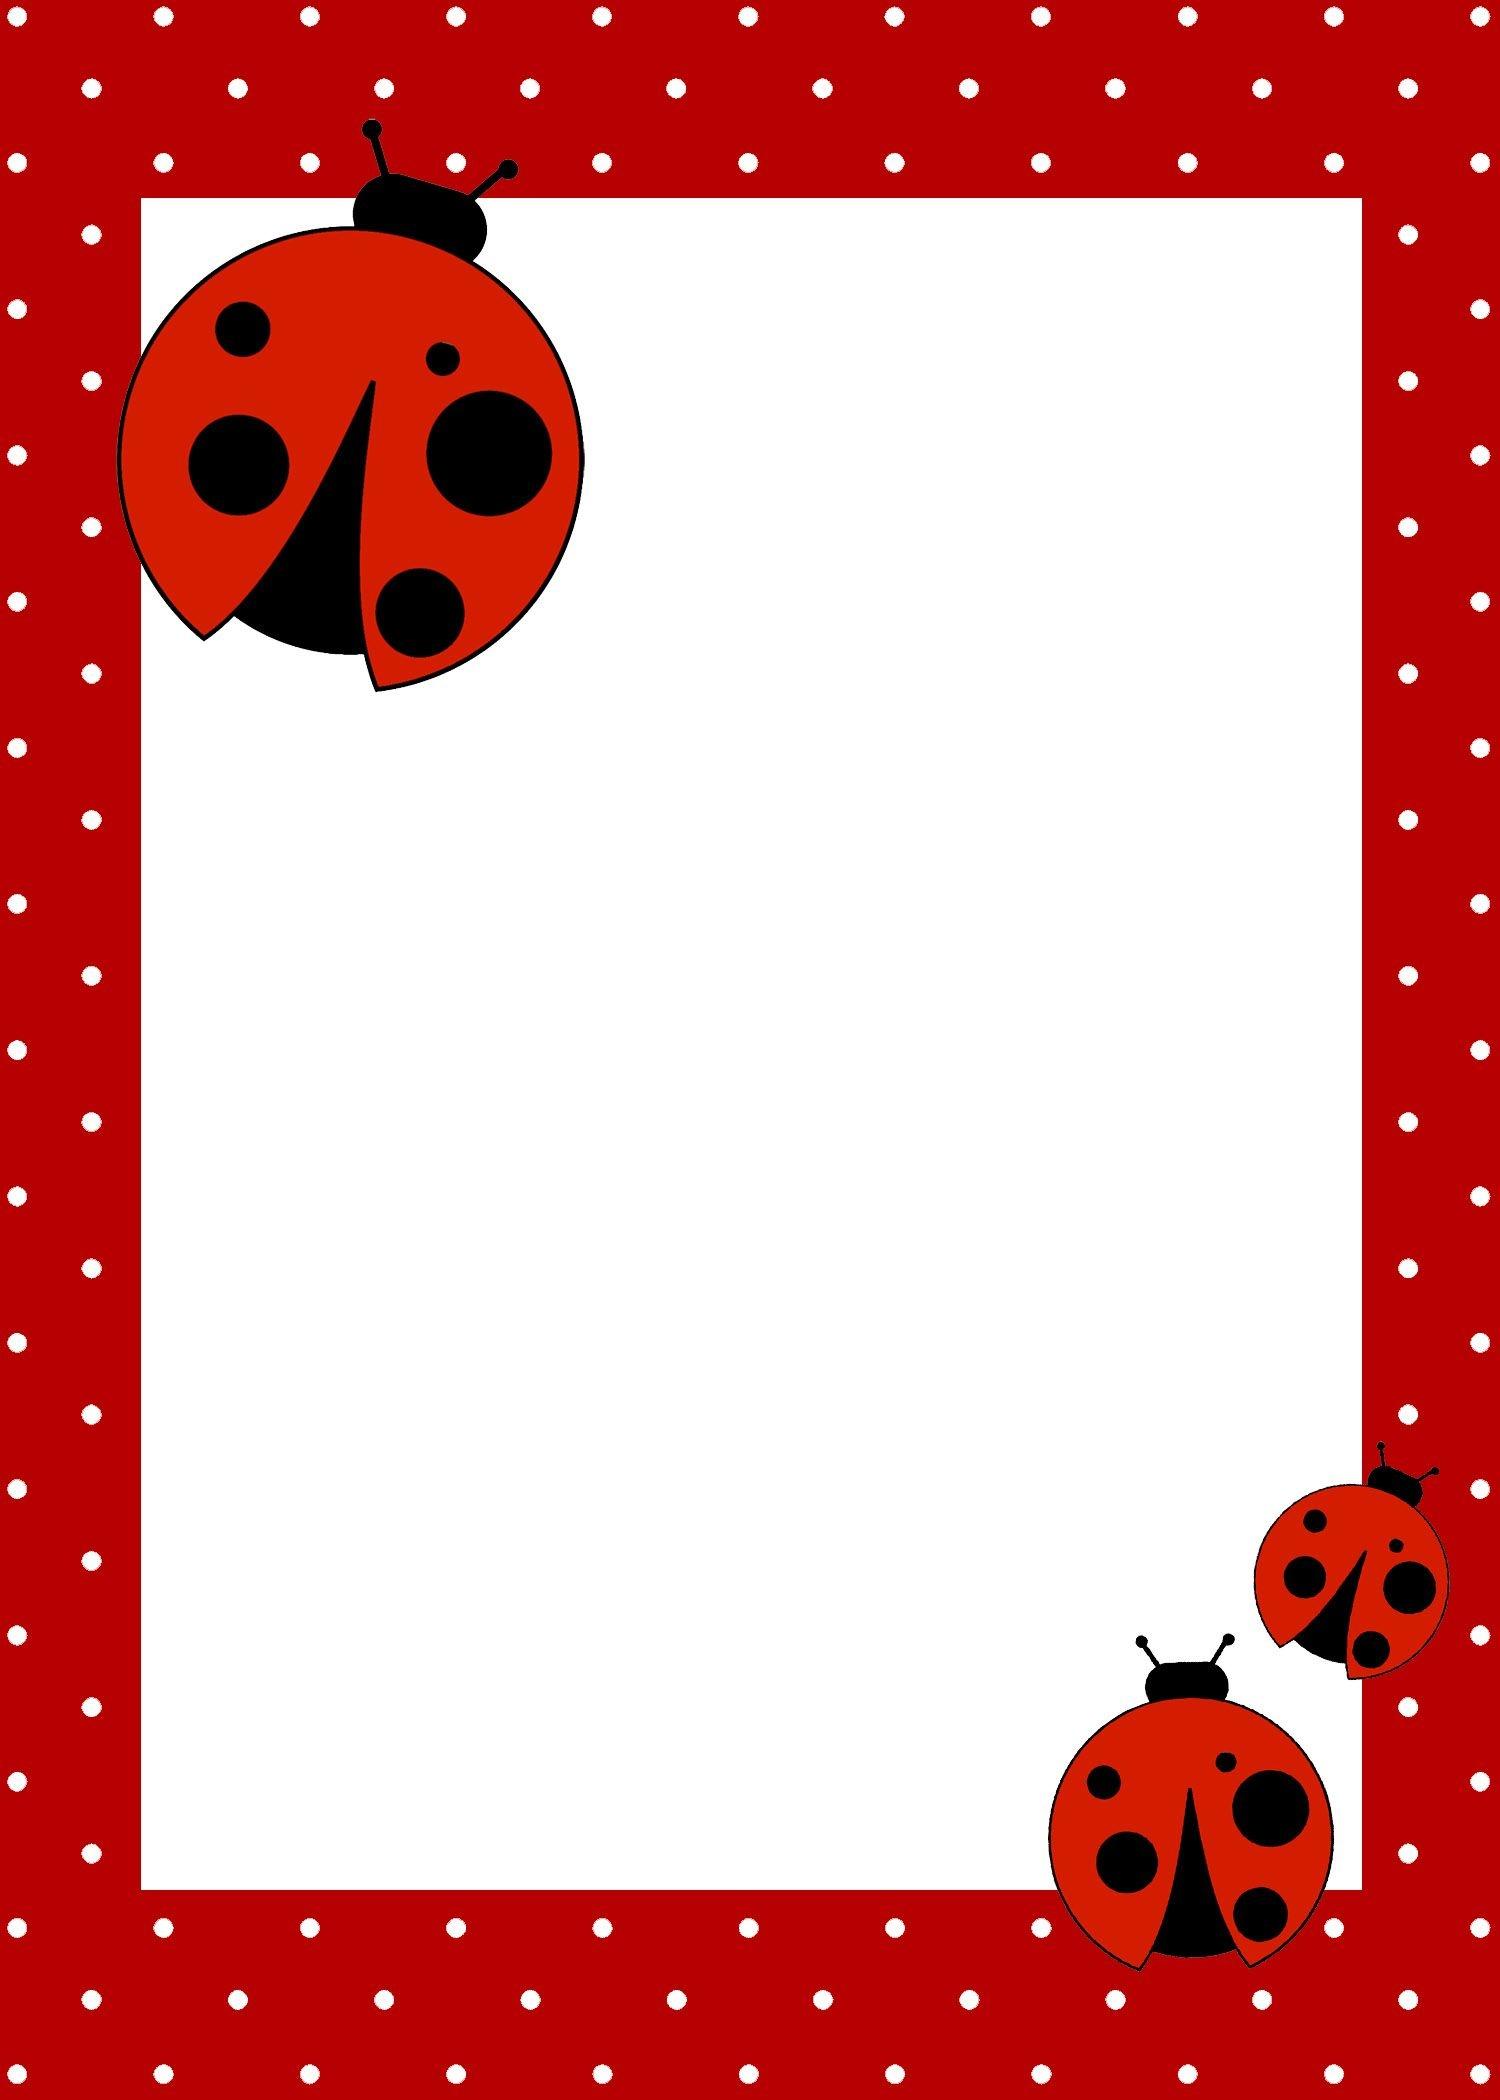 Ladybug Birthday Party With Free Printables   Cool Ideas - Free Printable Ladybug Stationery